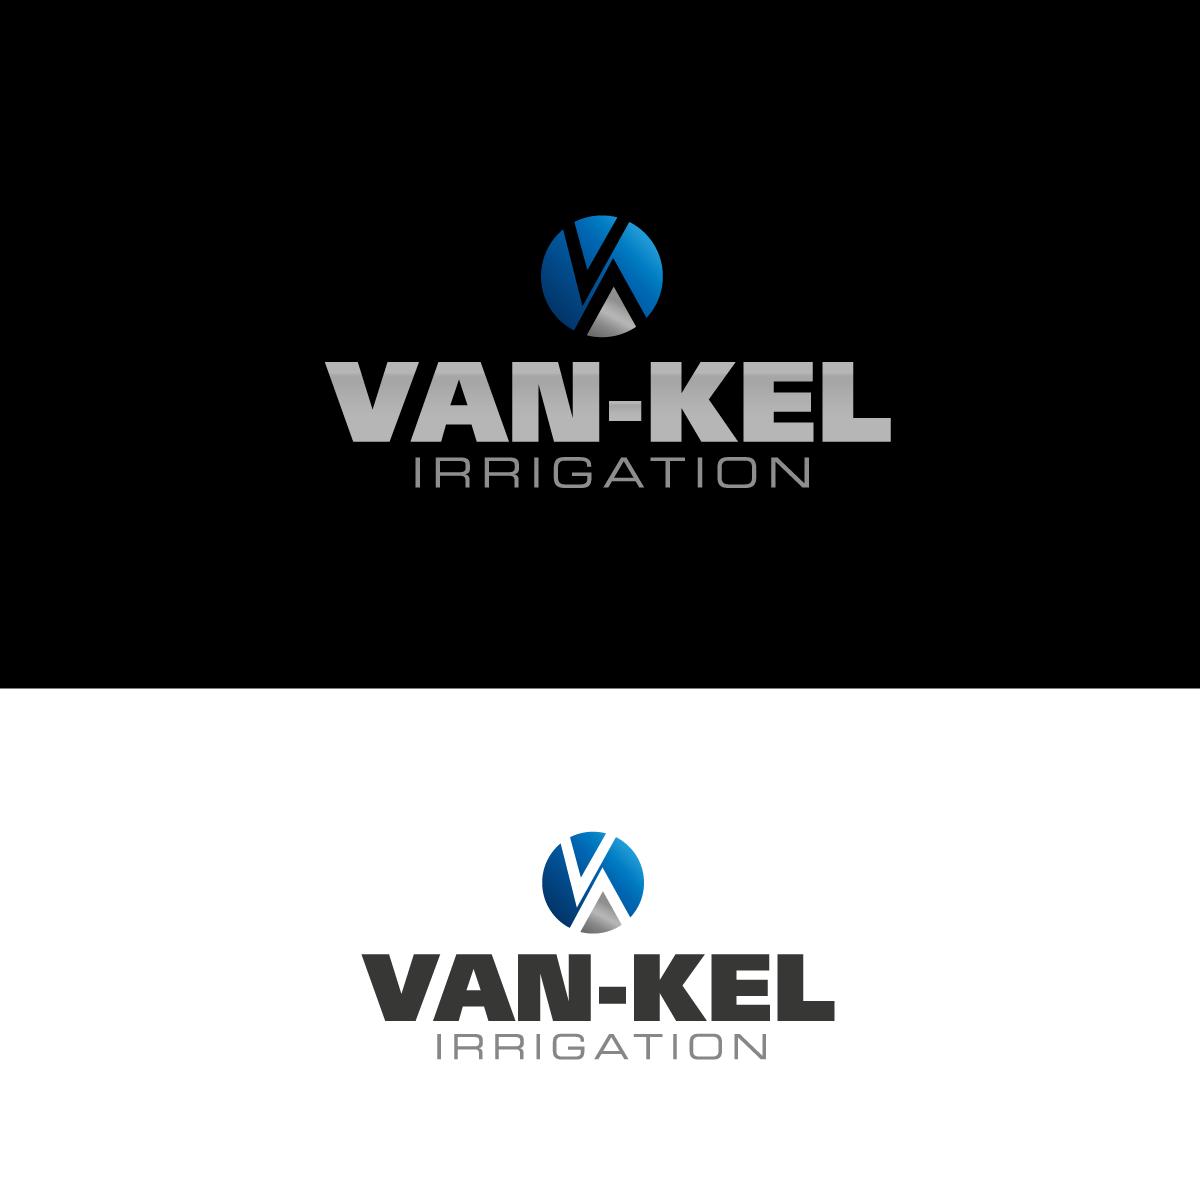 Logo Design by rockin - Entry No. 180 in the Logo Design Contest Van-Kel Irrigation Logo Design.